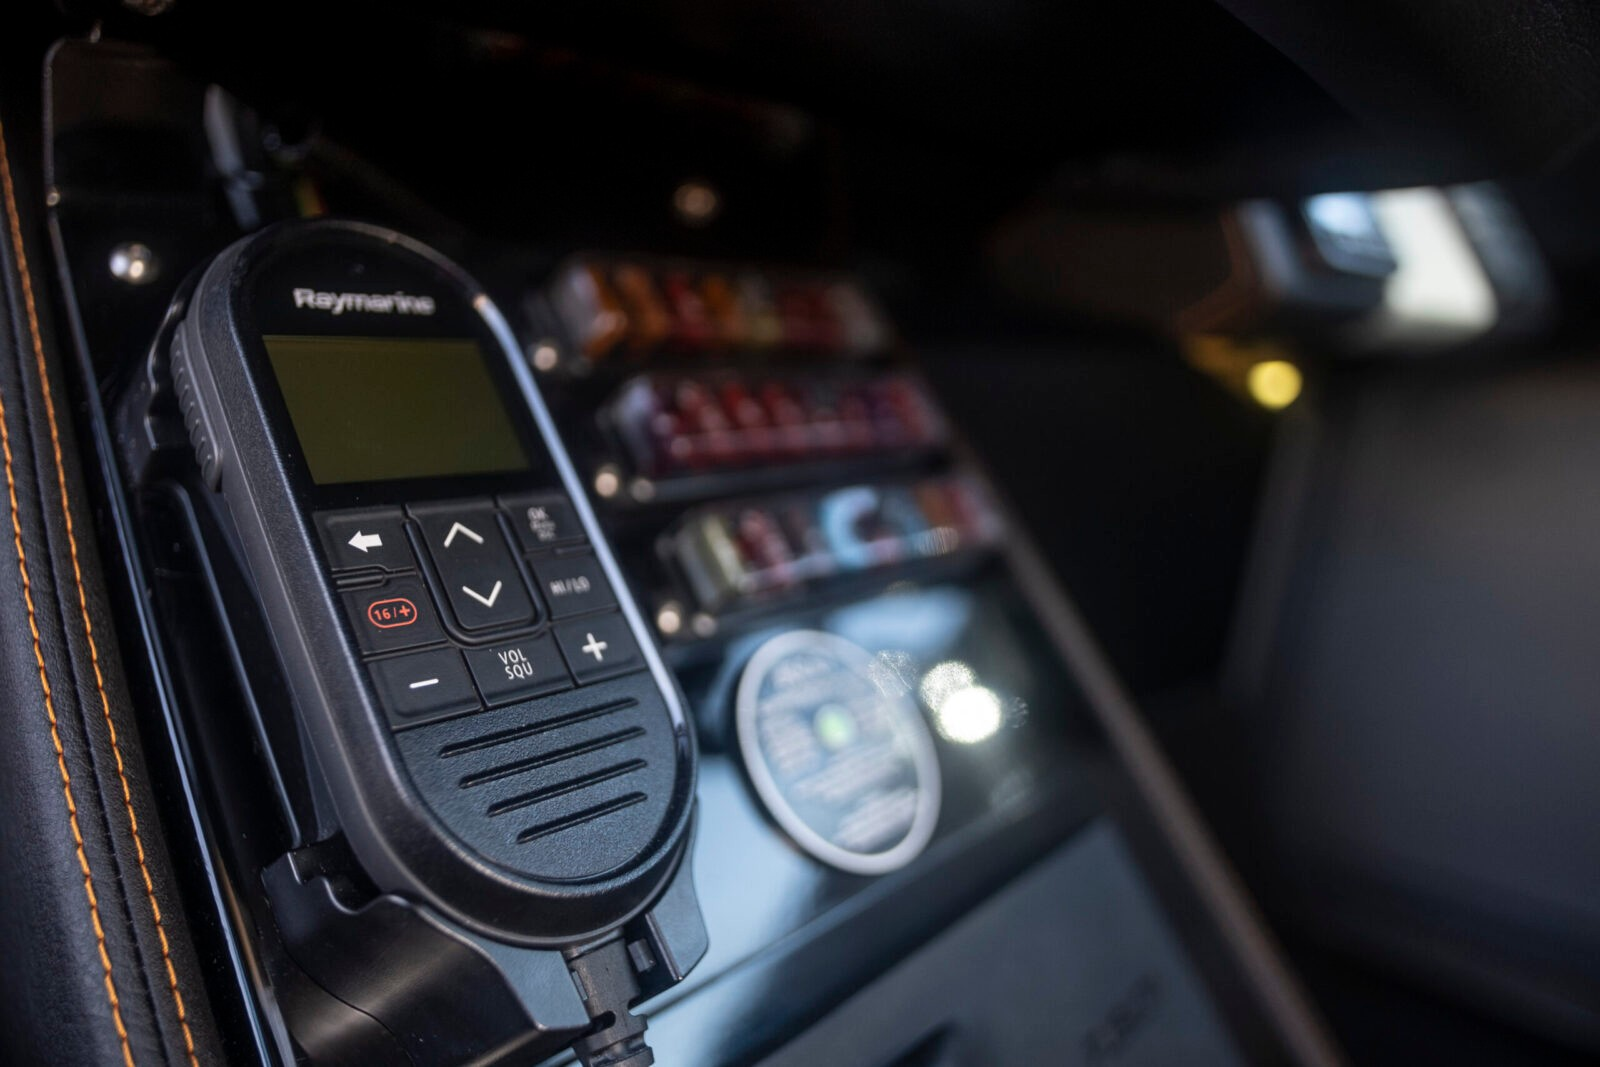 Радиостанция Raymarine VHF / Ray 90